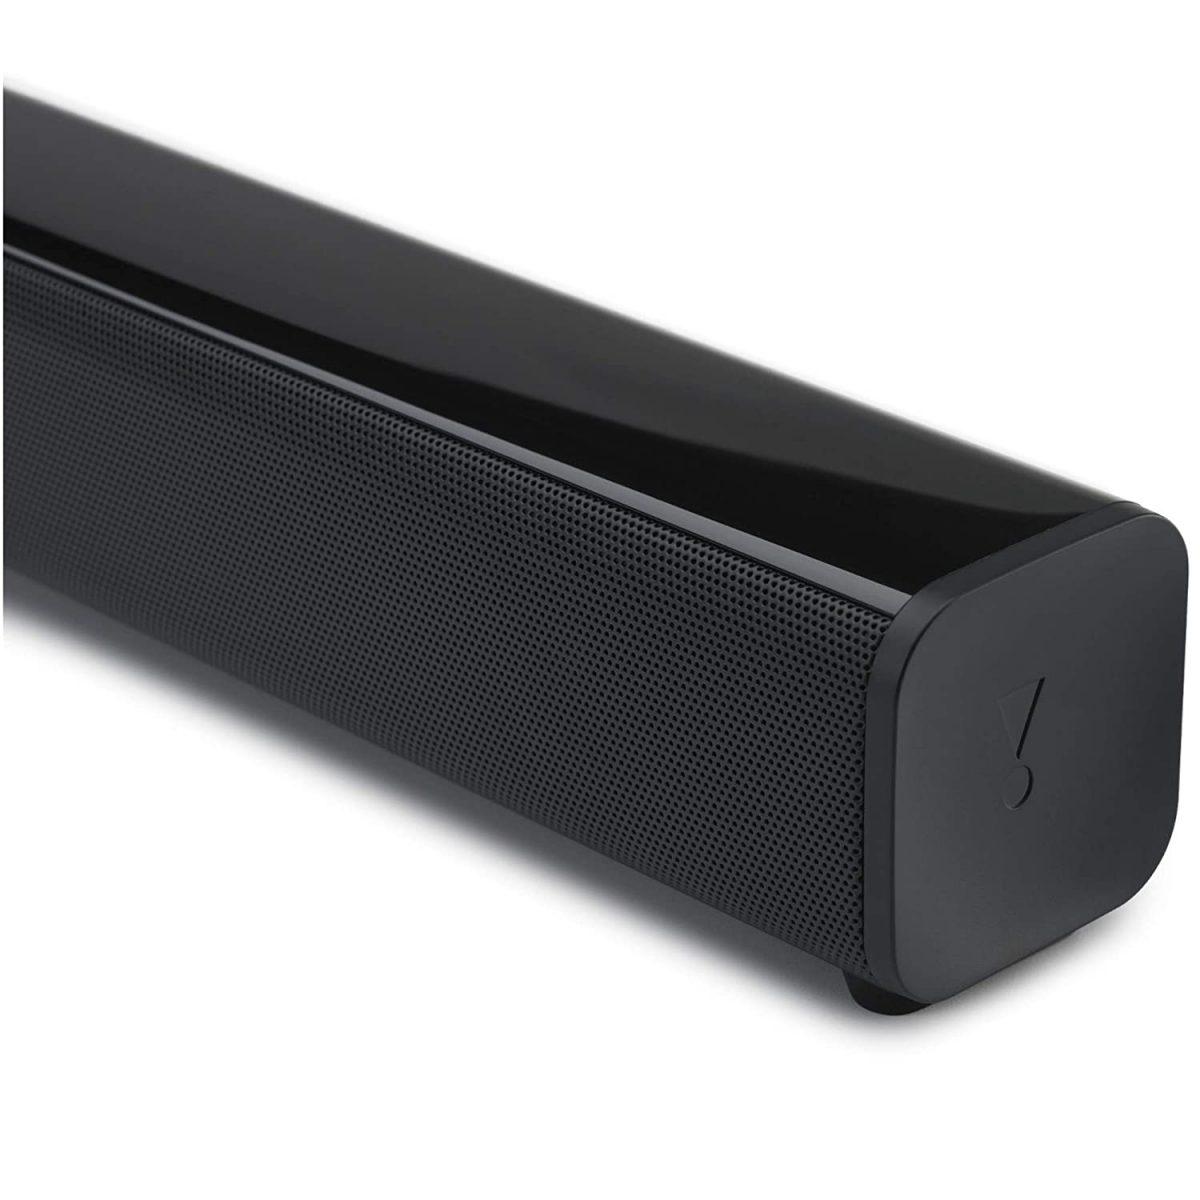 JBL Cinema SB160 2.1 Channel Soundbar with Wireless Subwoofer